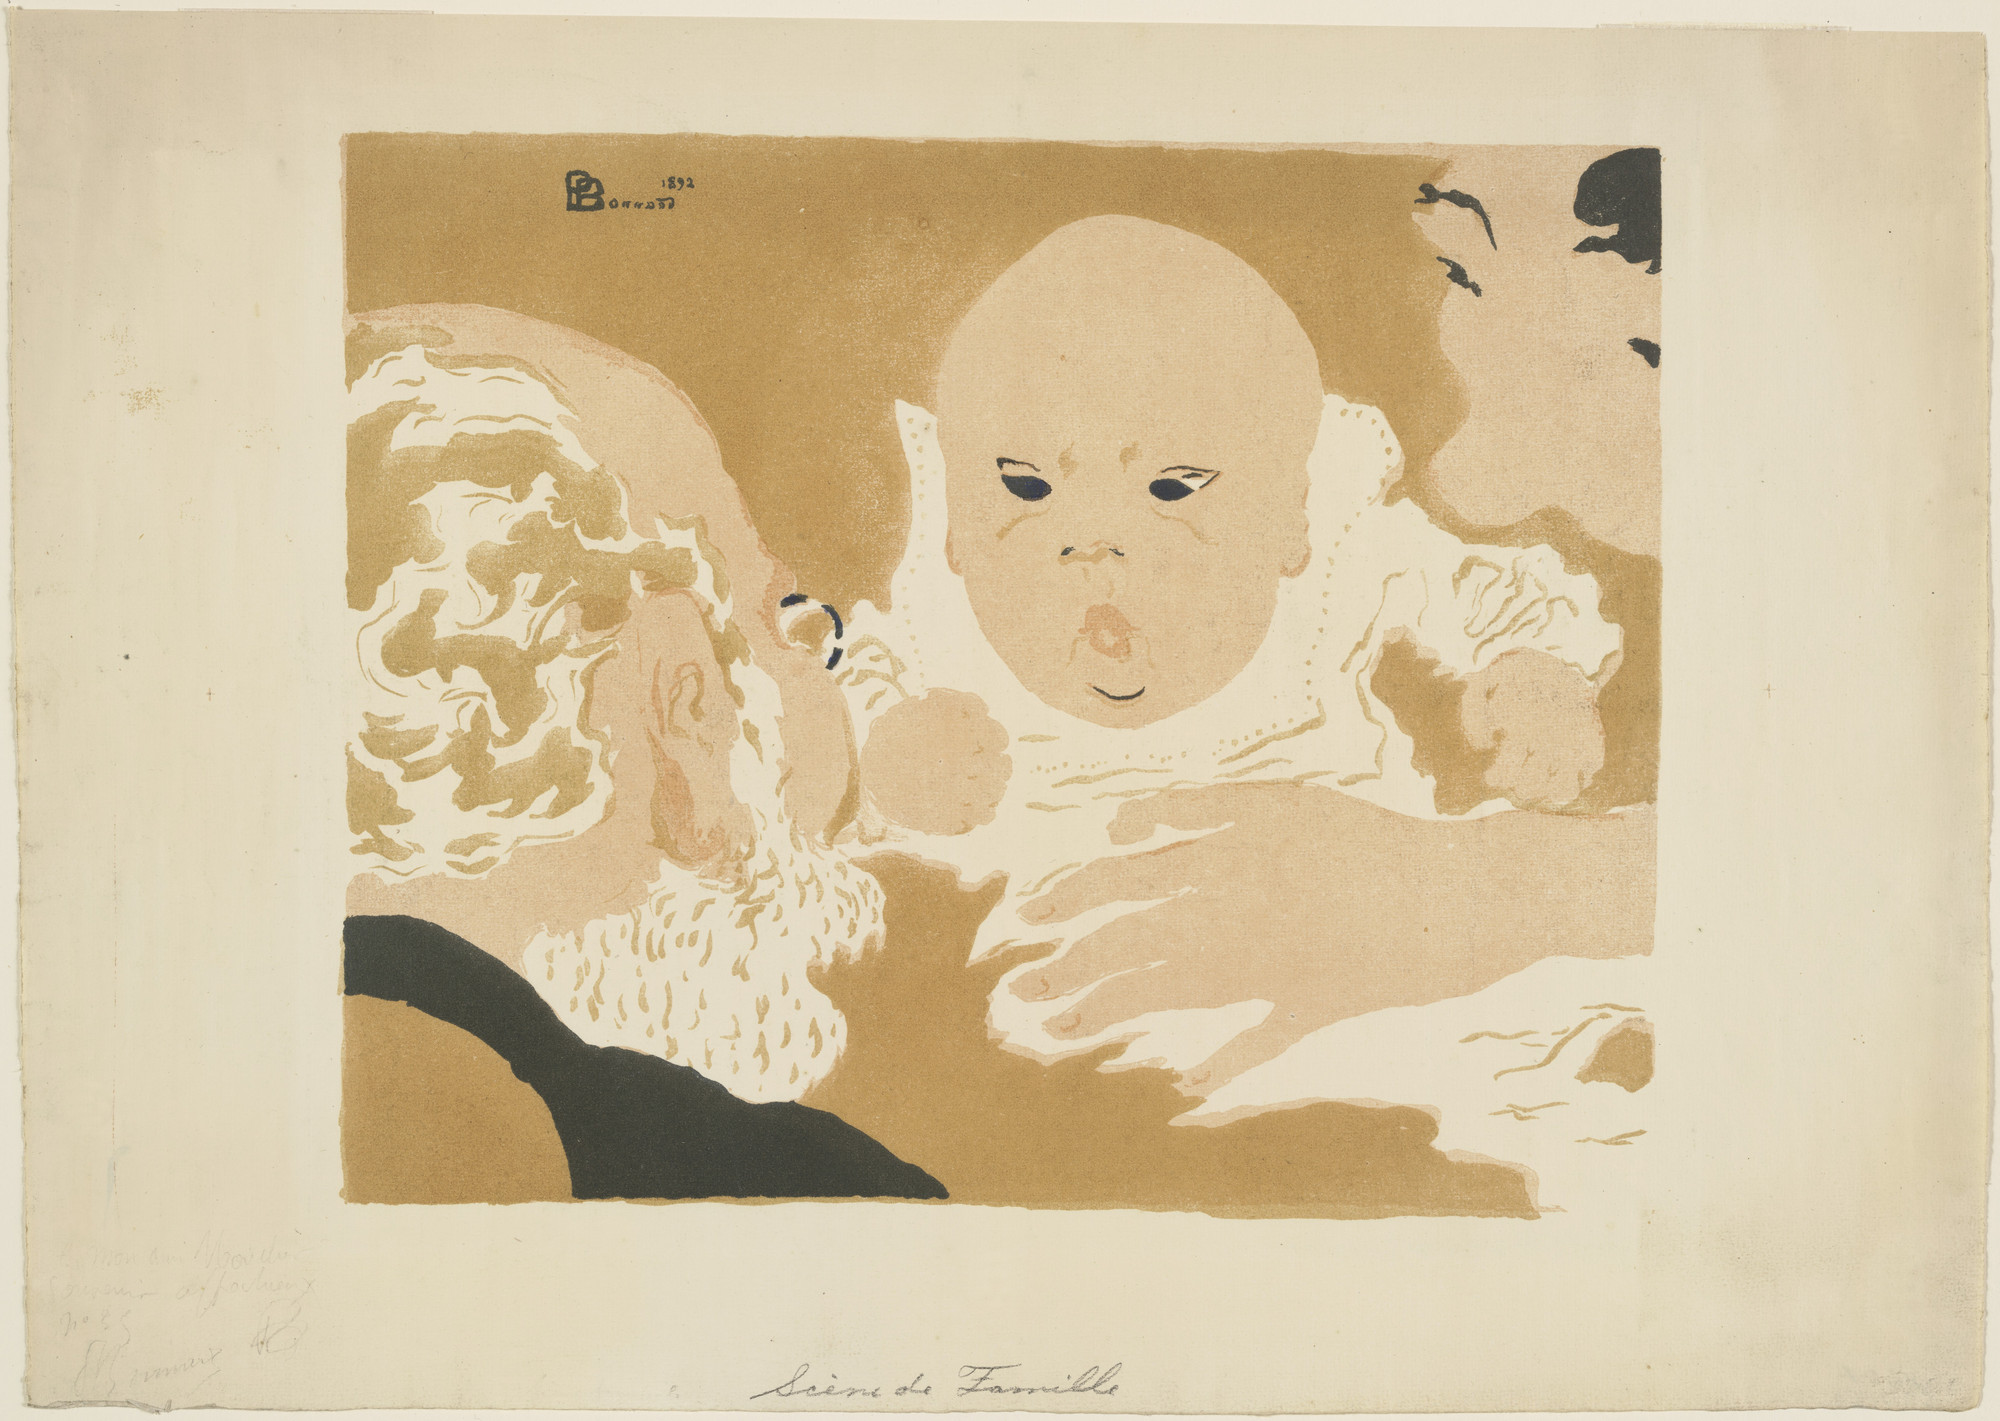 Pierre bonnard family scene scène de famille 1892